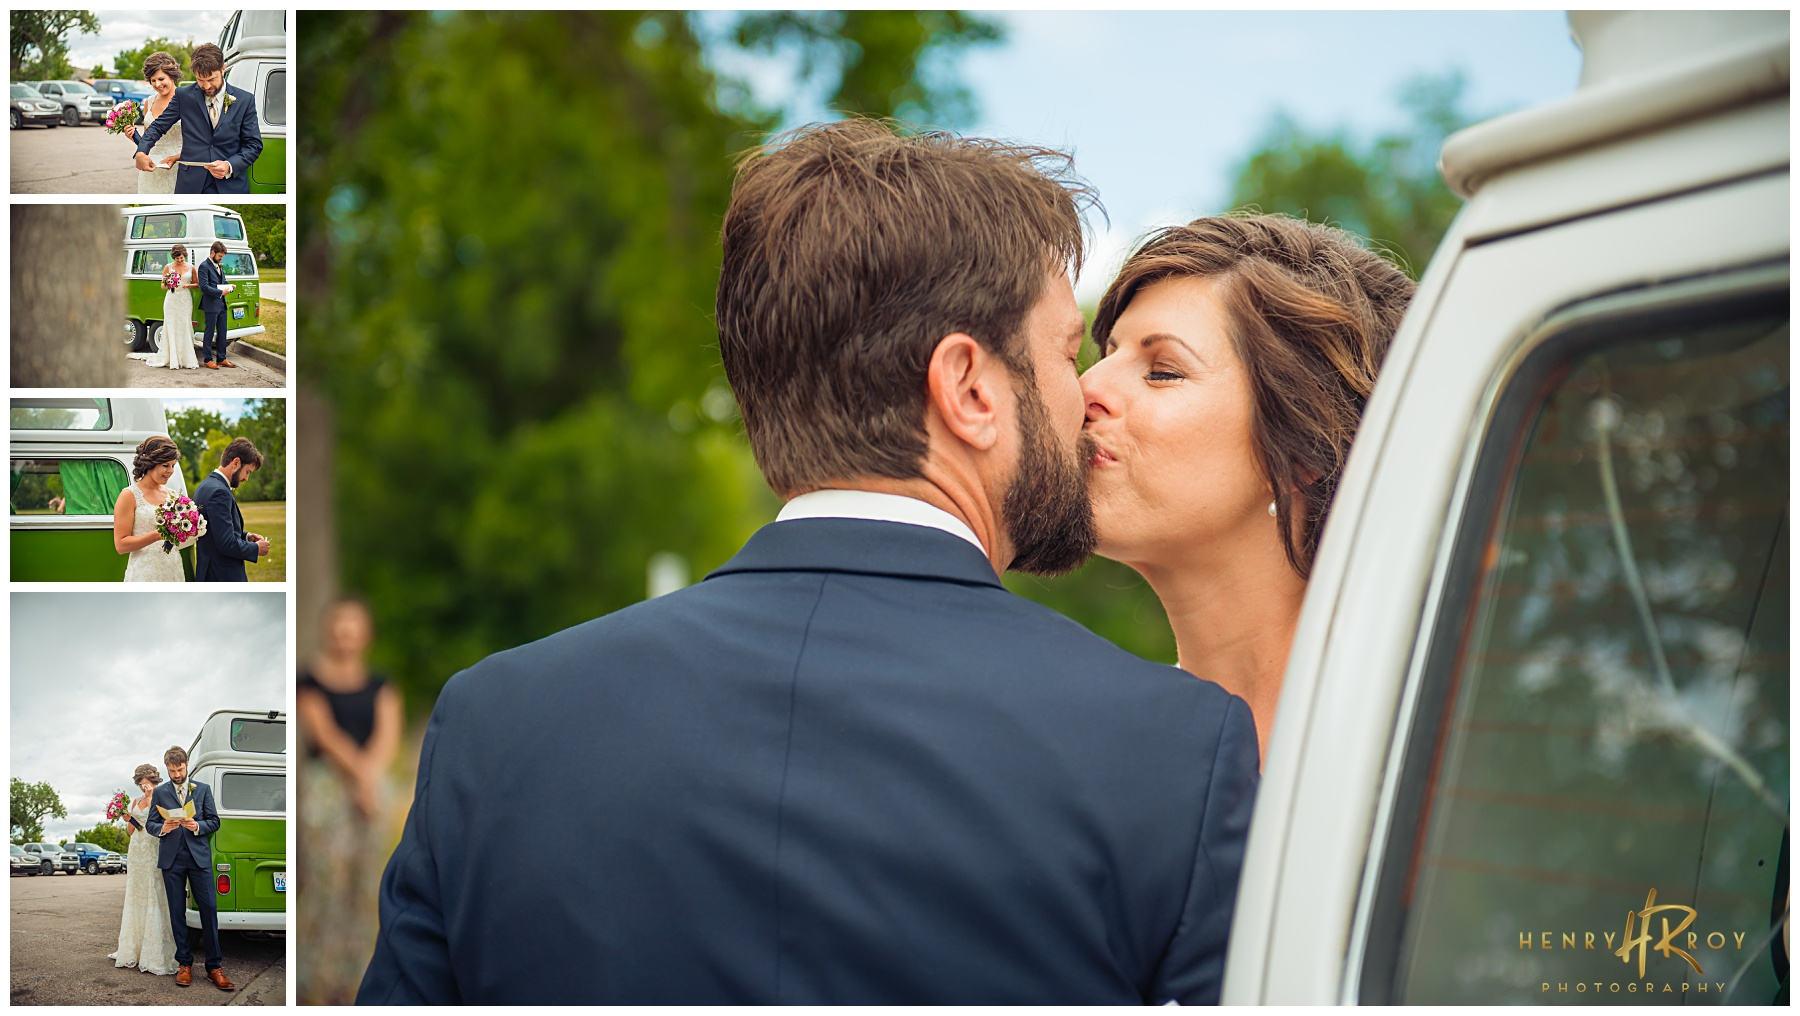 Rapid City Wedding Photographer009.jpg